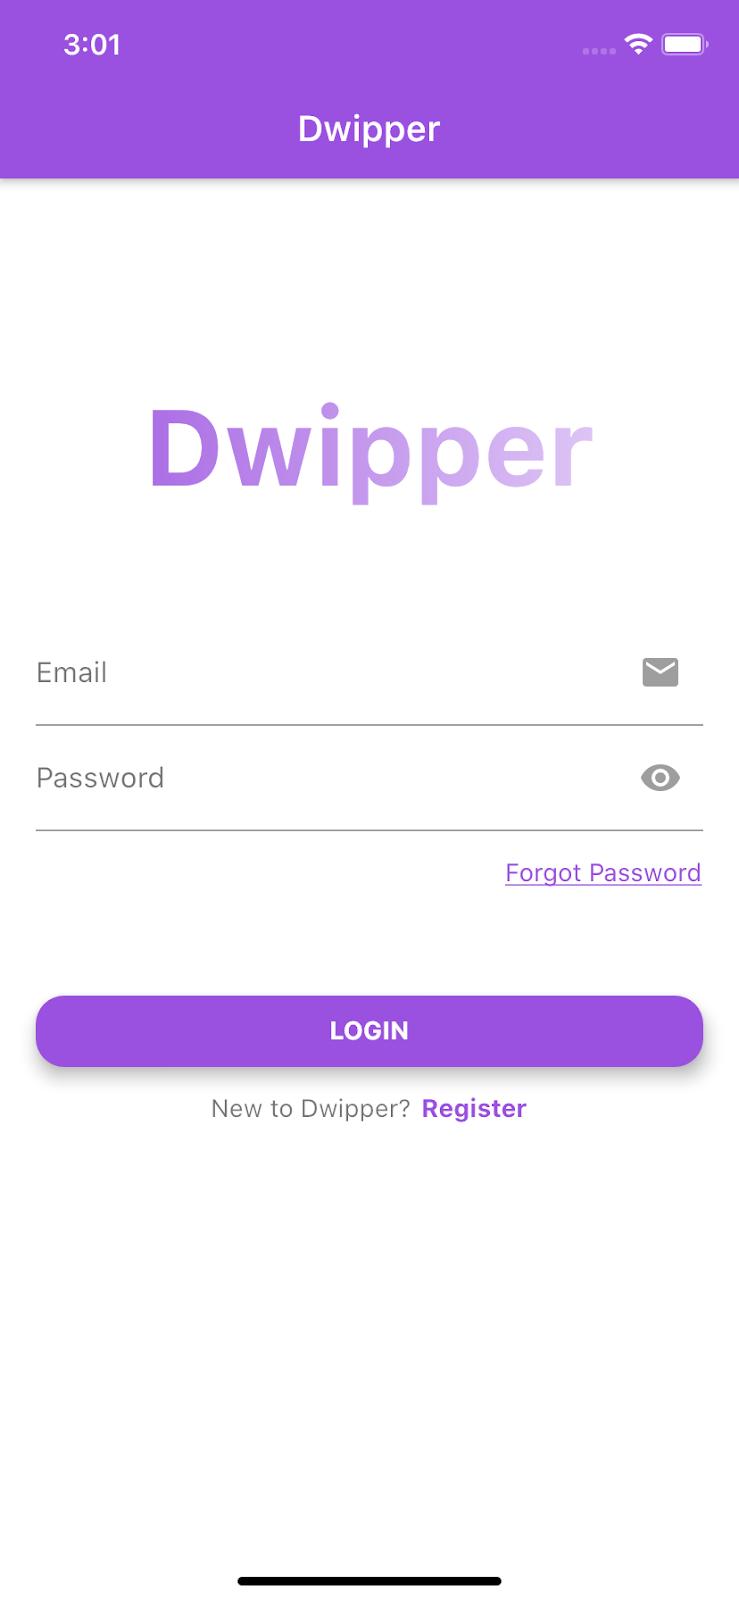 Dwipper login screen in Flutter